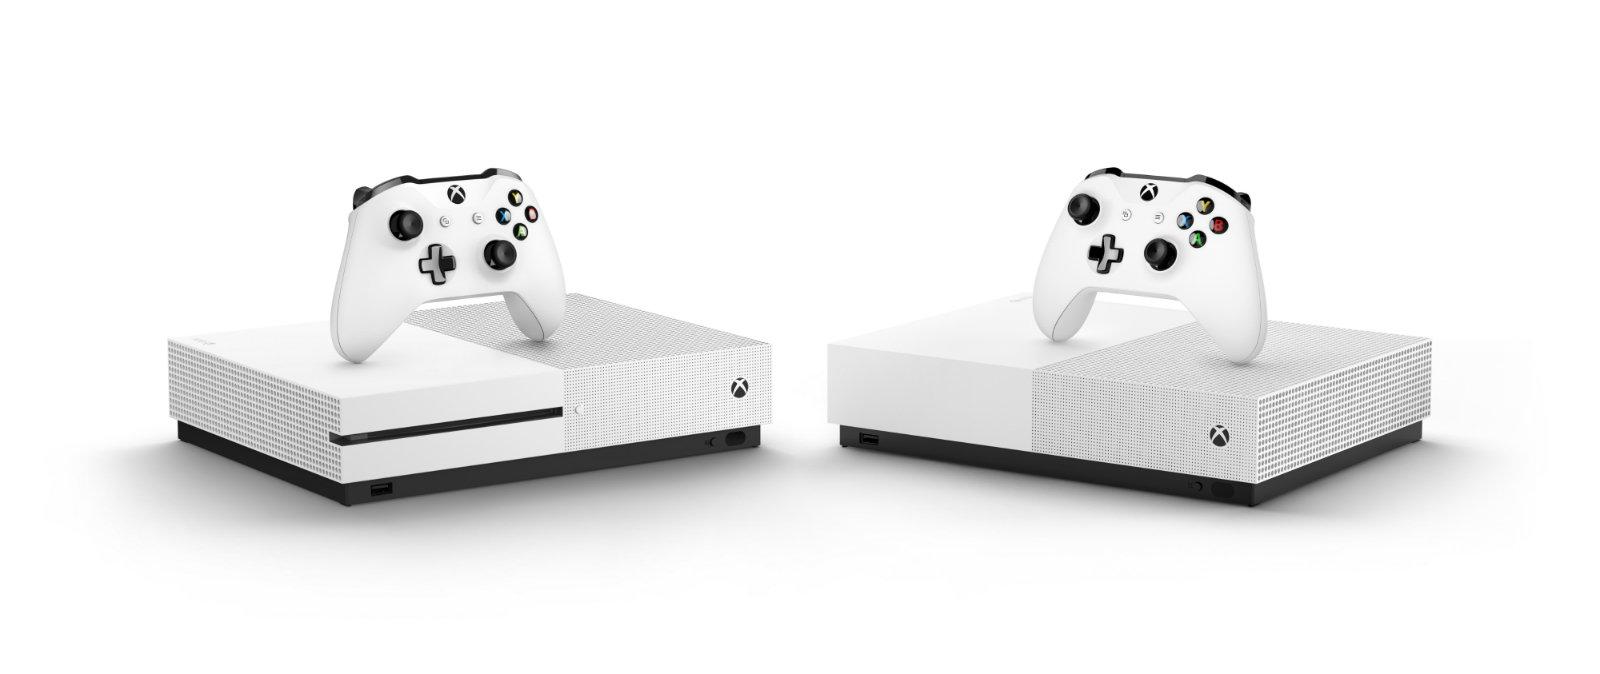 disc-free Xbox One S